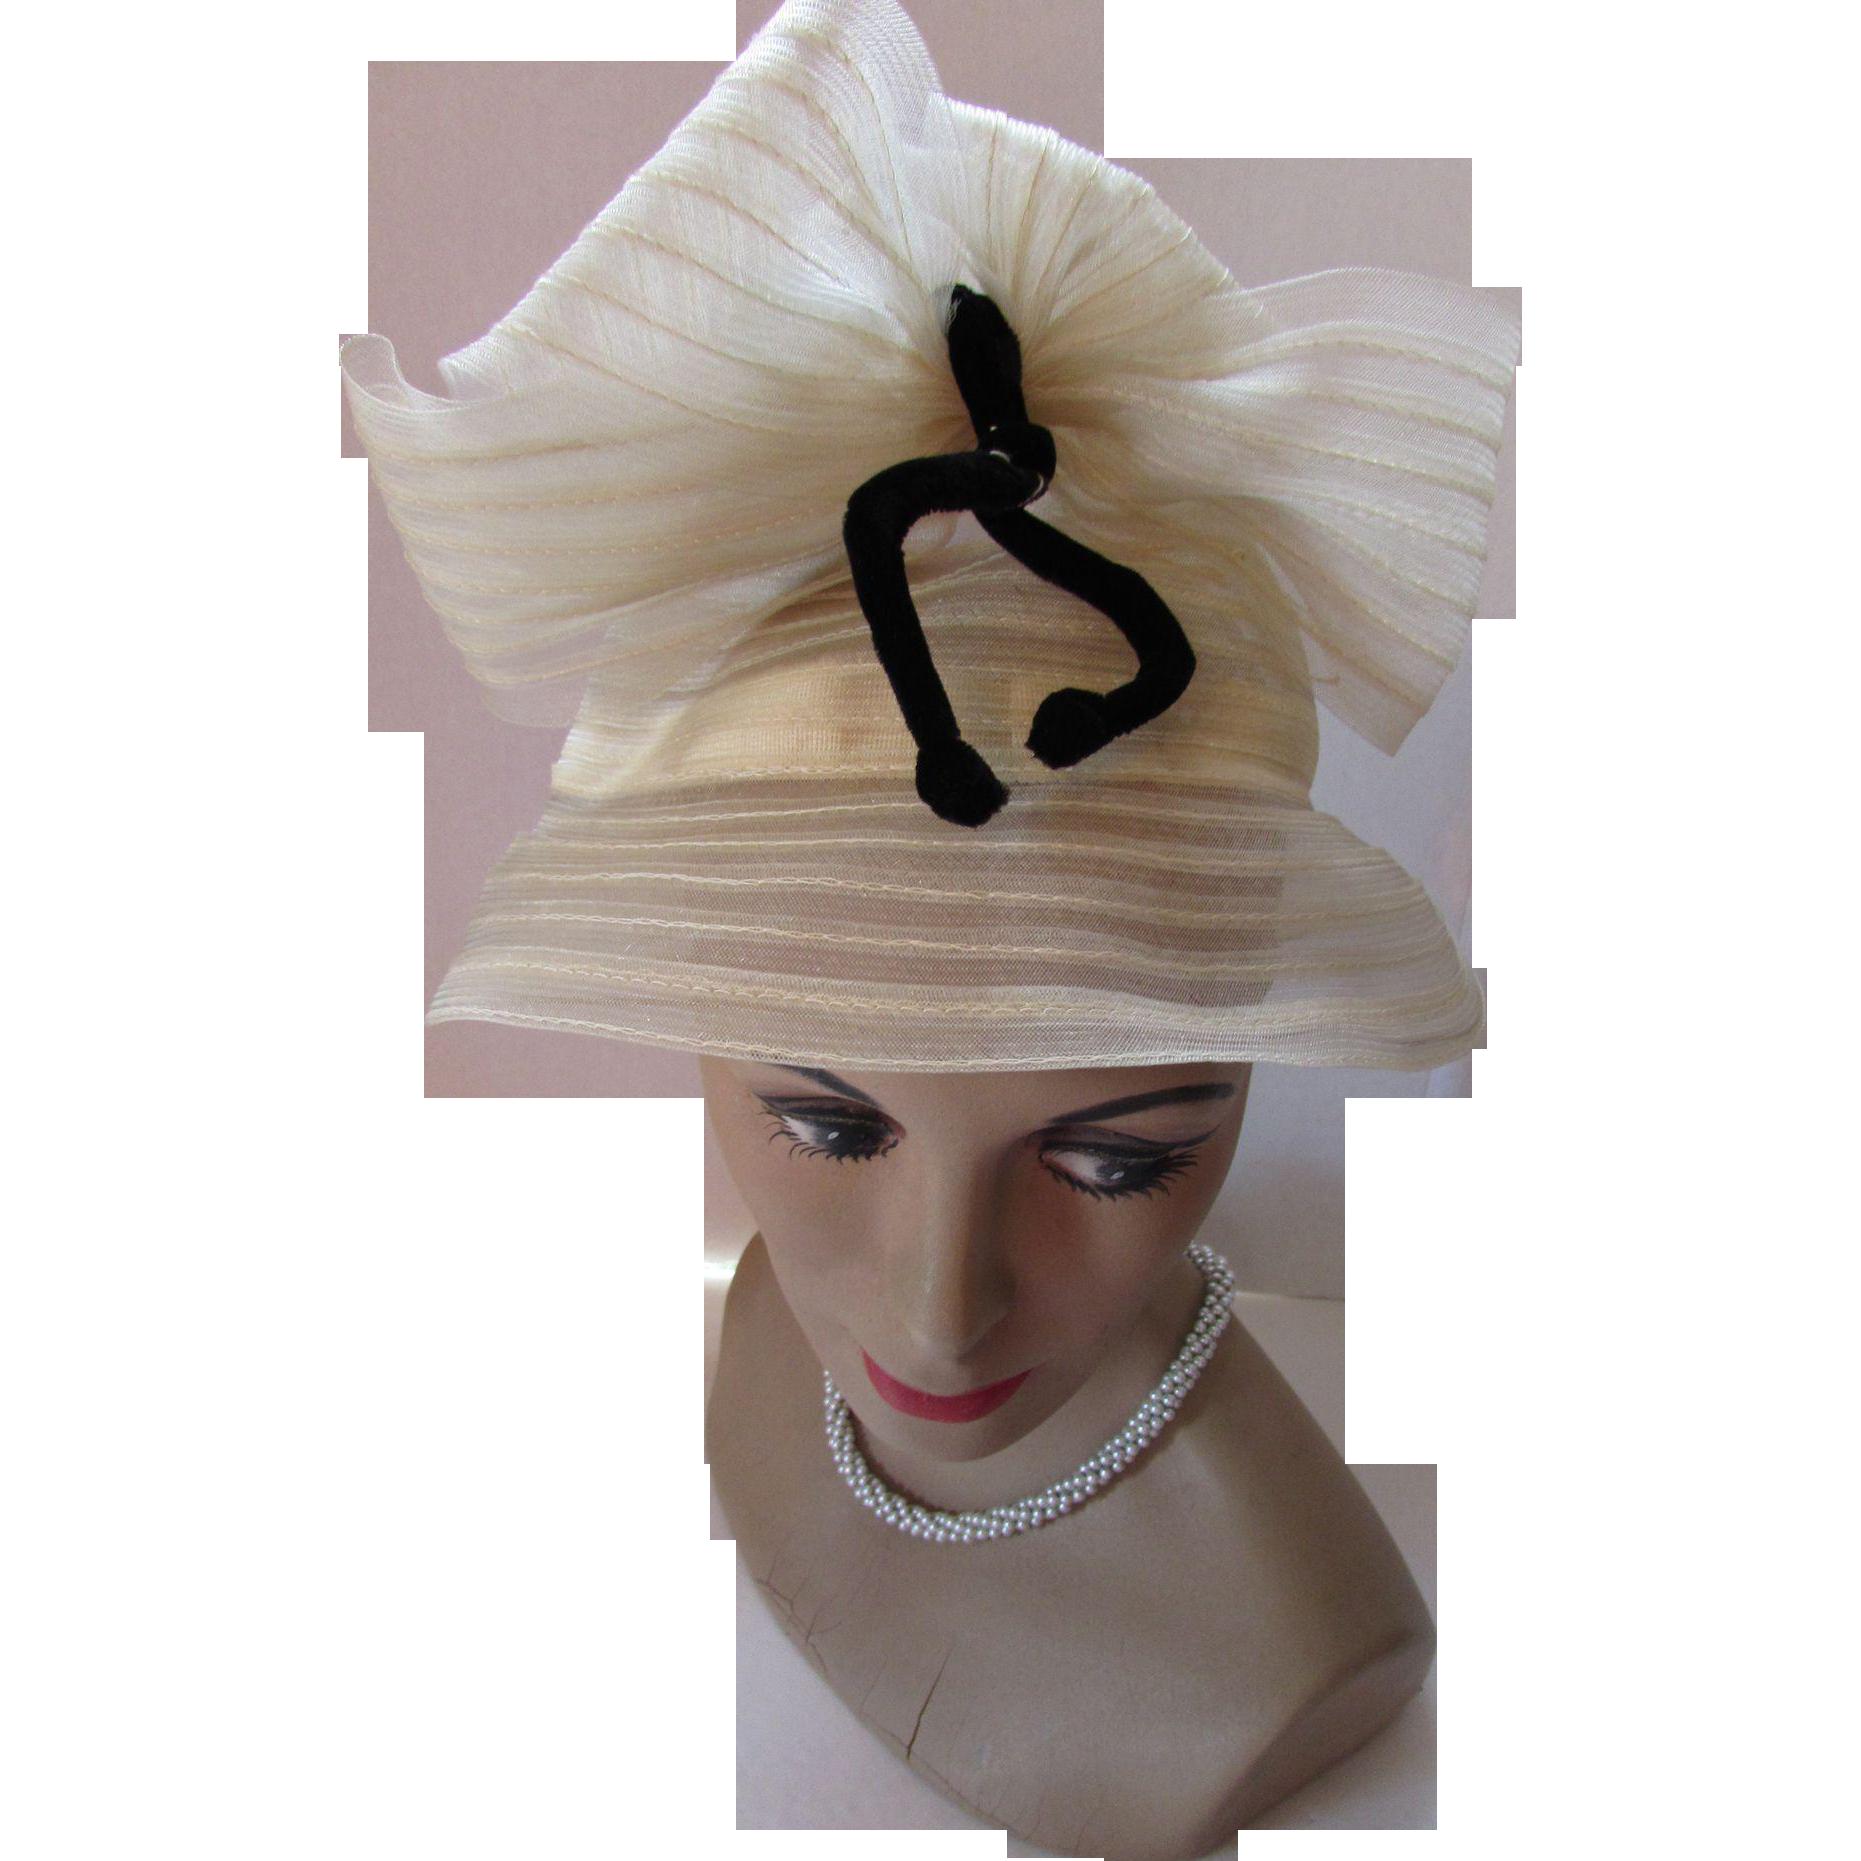 Unusual Sheer Hat in Cream Tone Weave High Crown with Black Velvet Bow